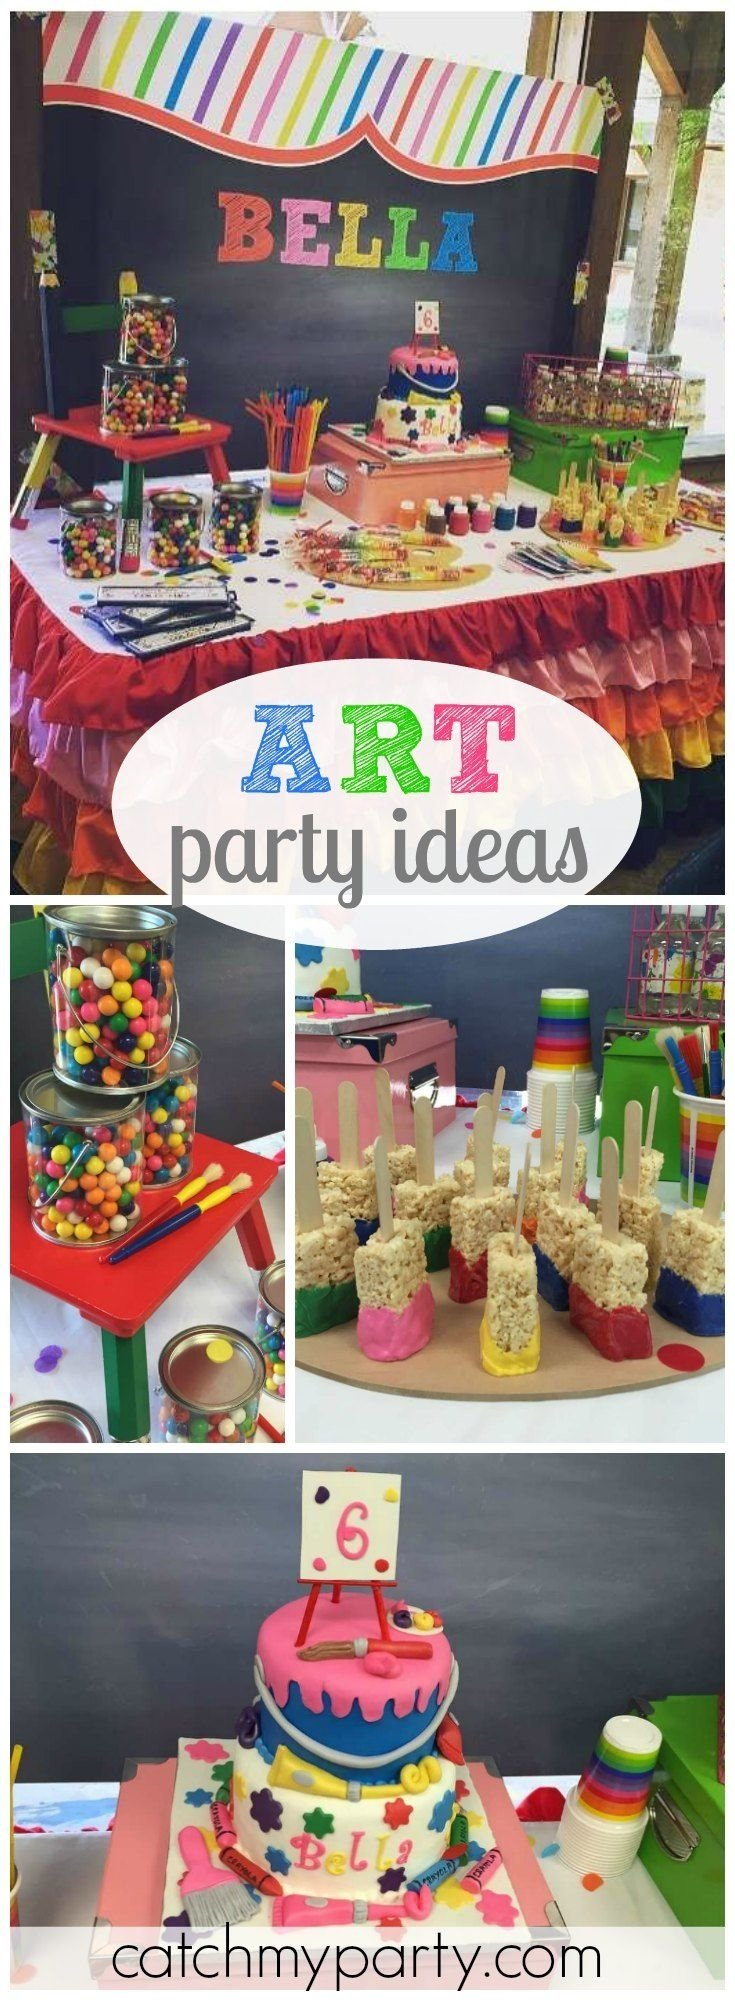 272 best art party ideas images on pinterest | birthday party ideas